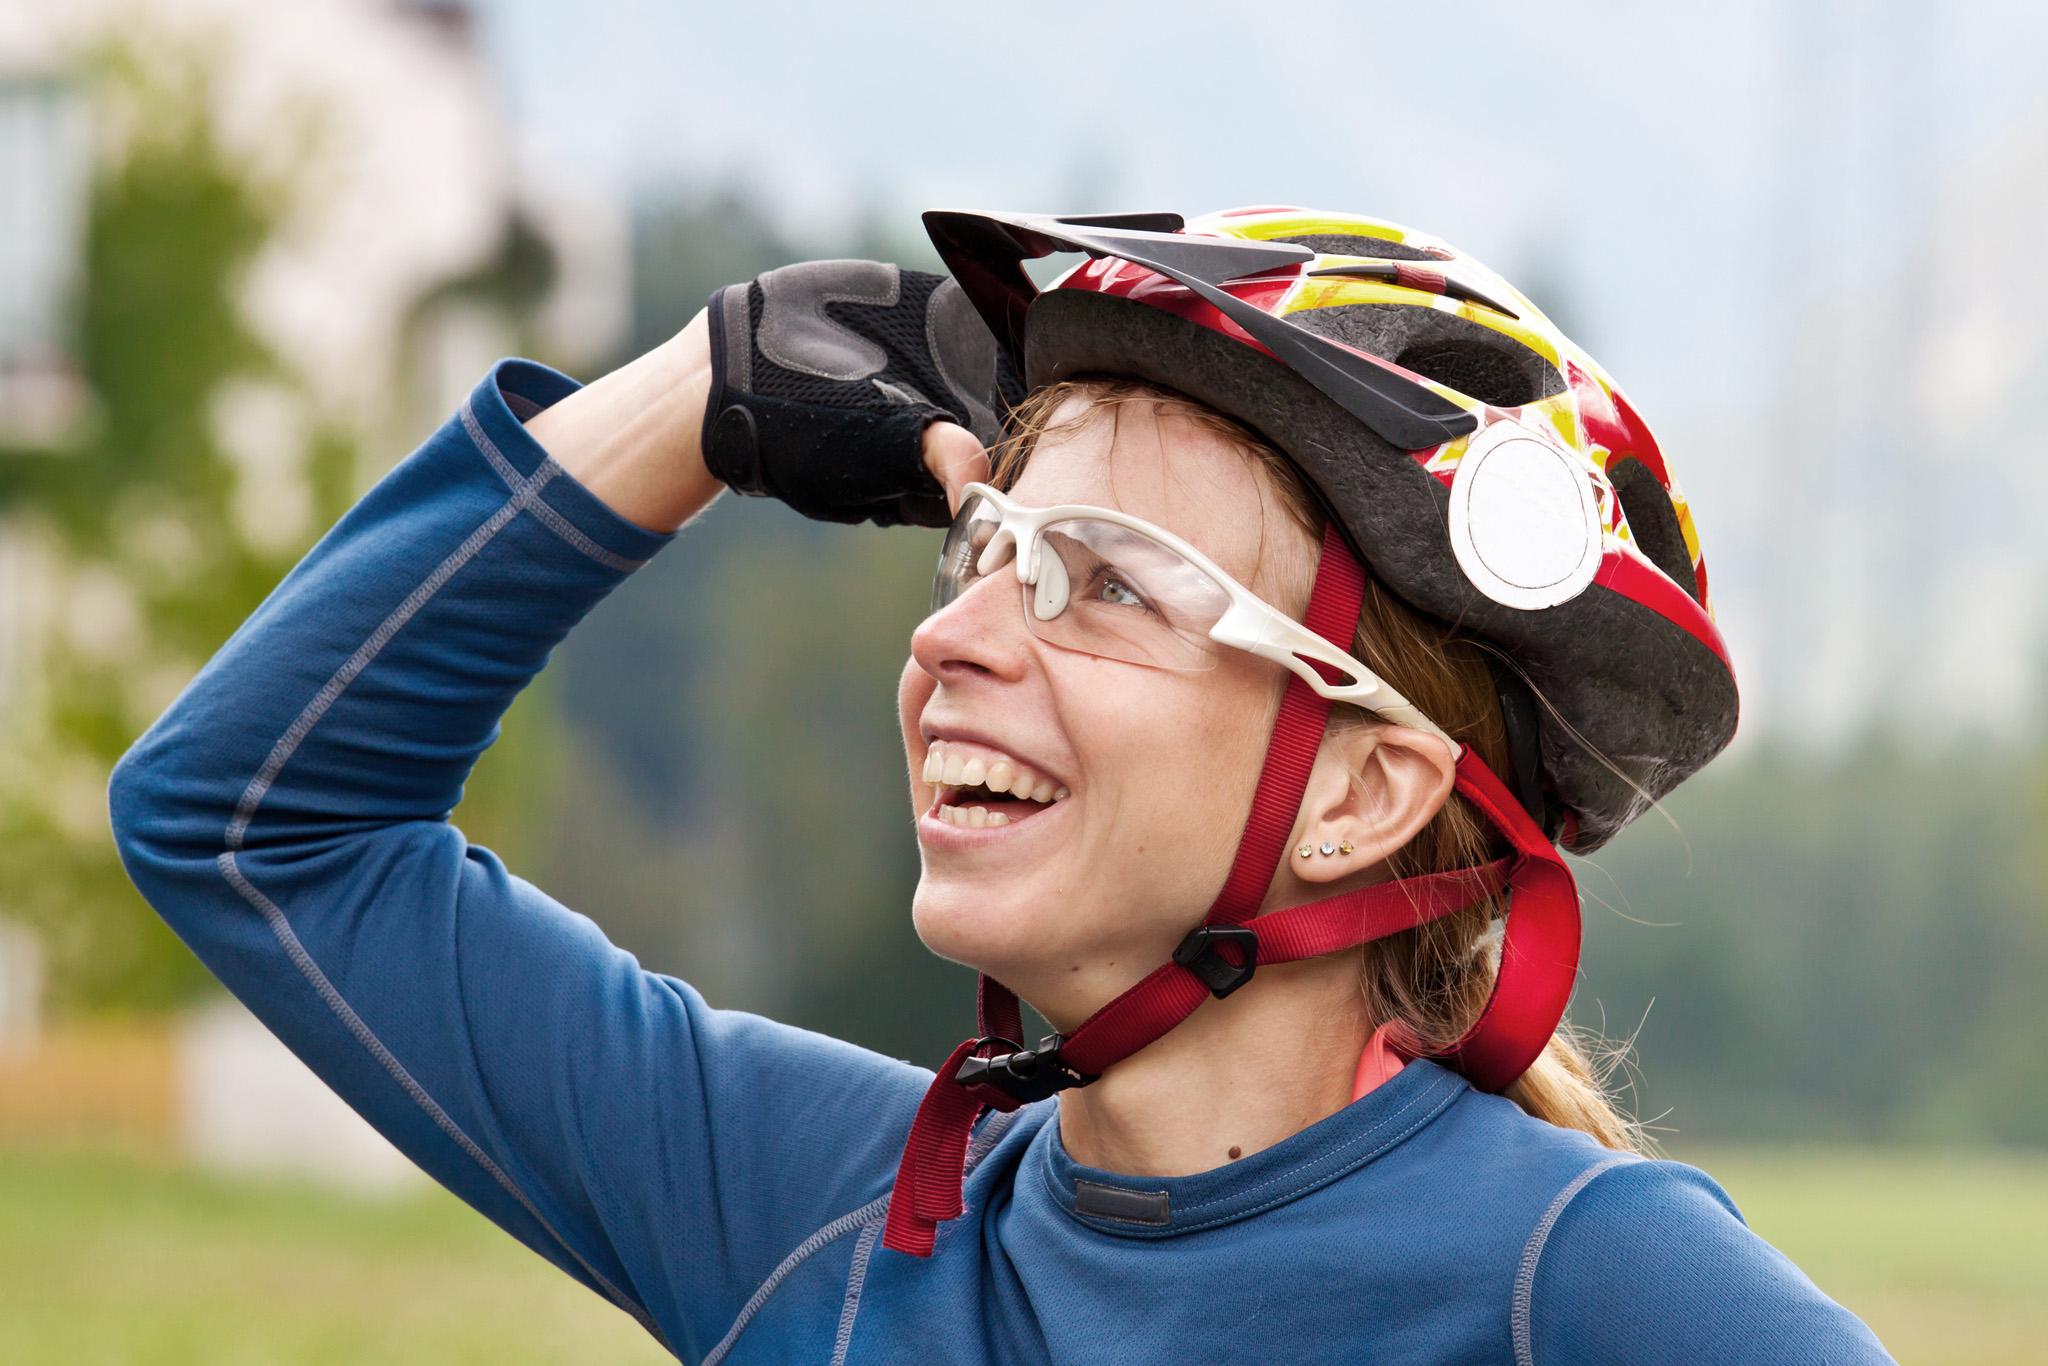 Sportbrille mit Sehstärke